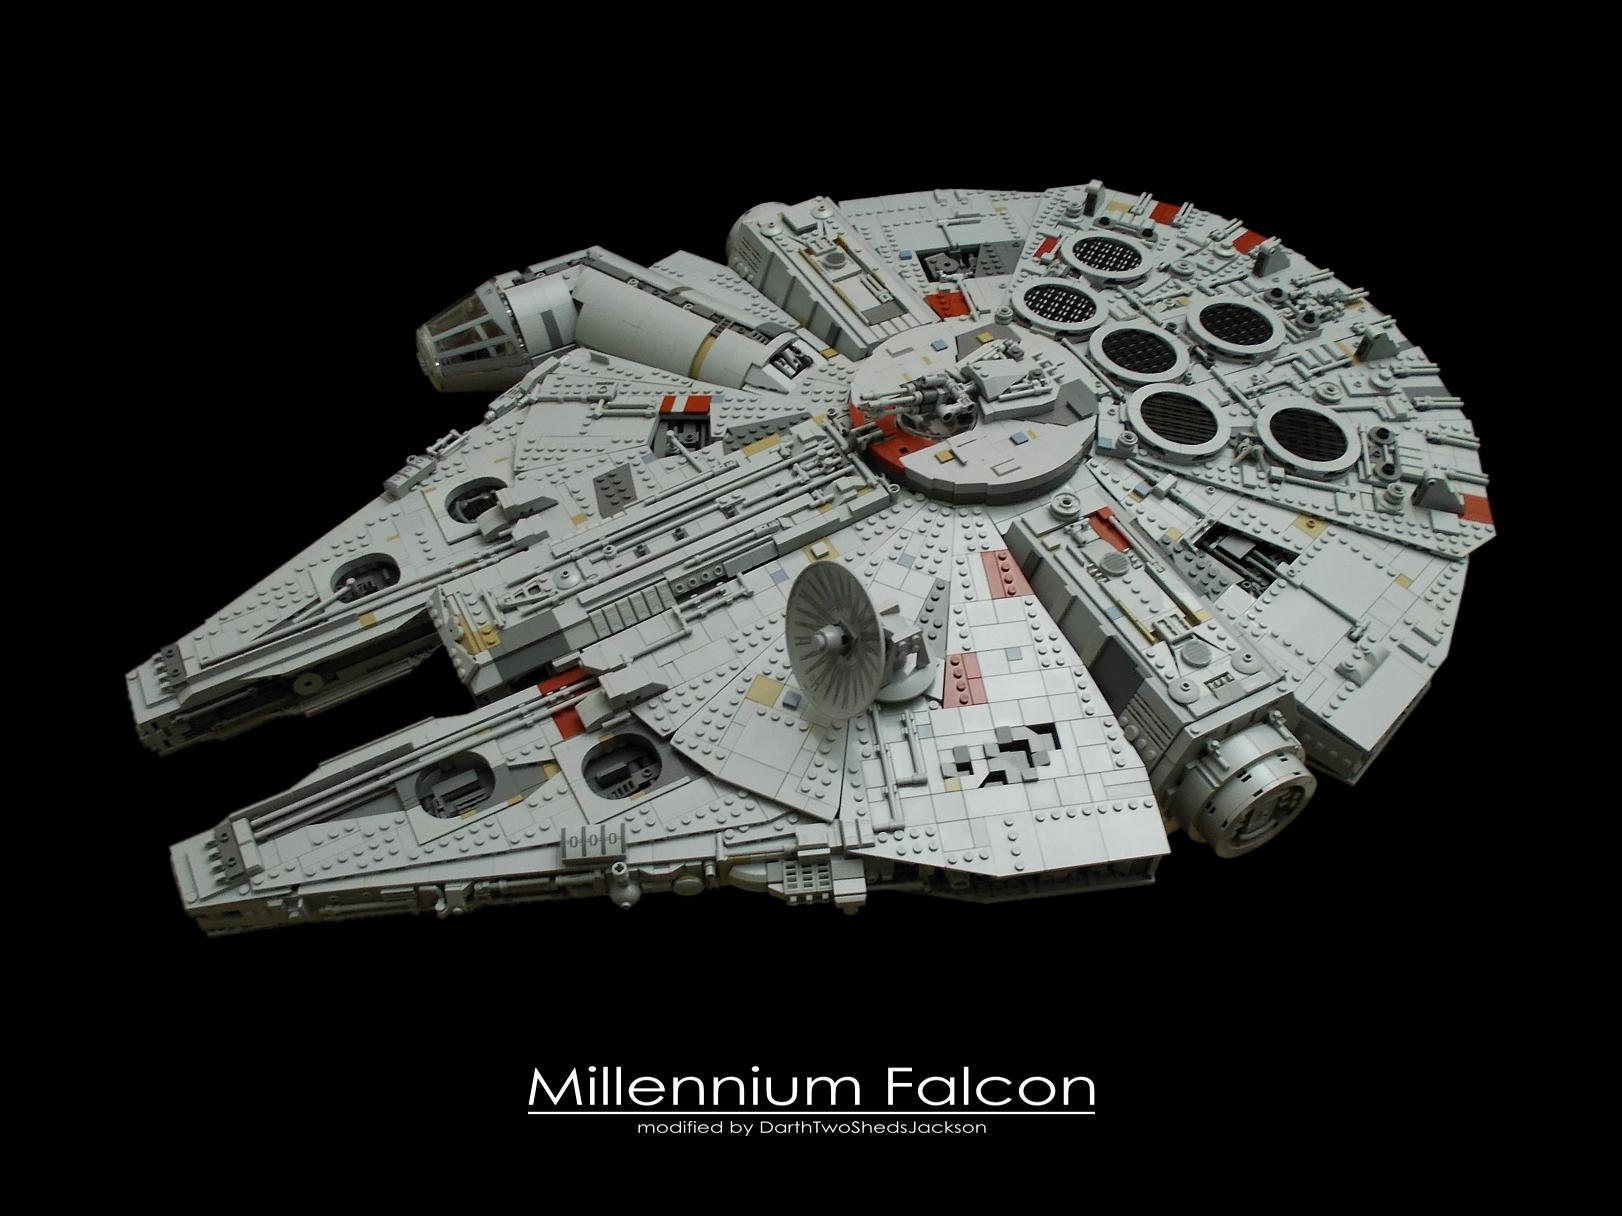 MillenniumFalcon002.jpg.27970805002b131e